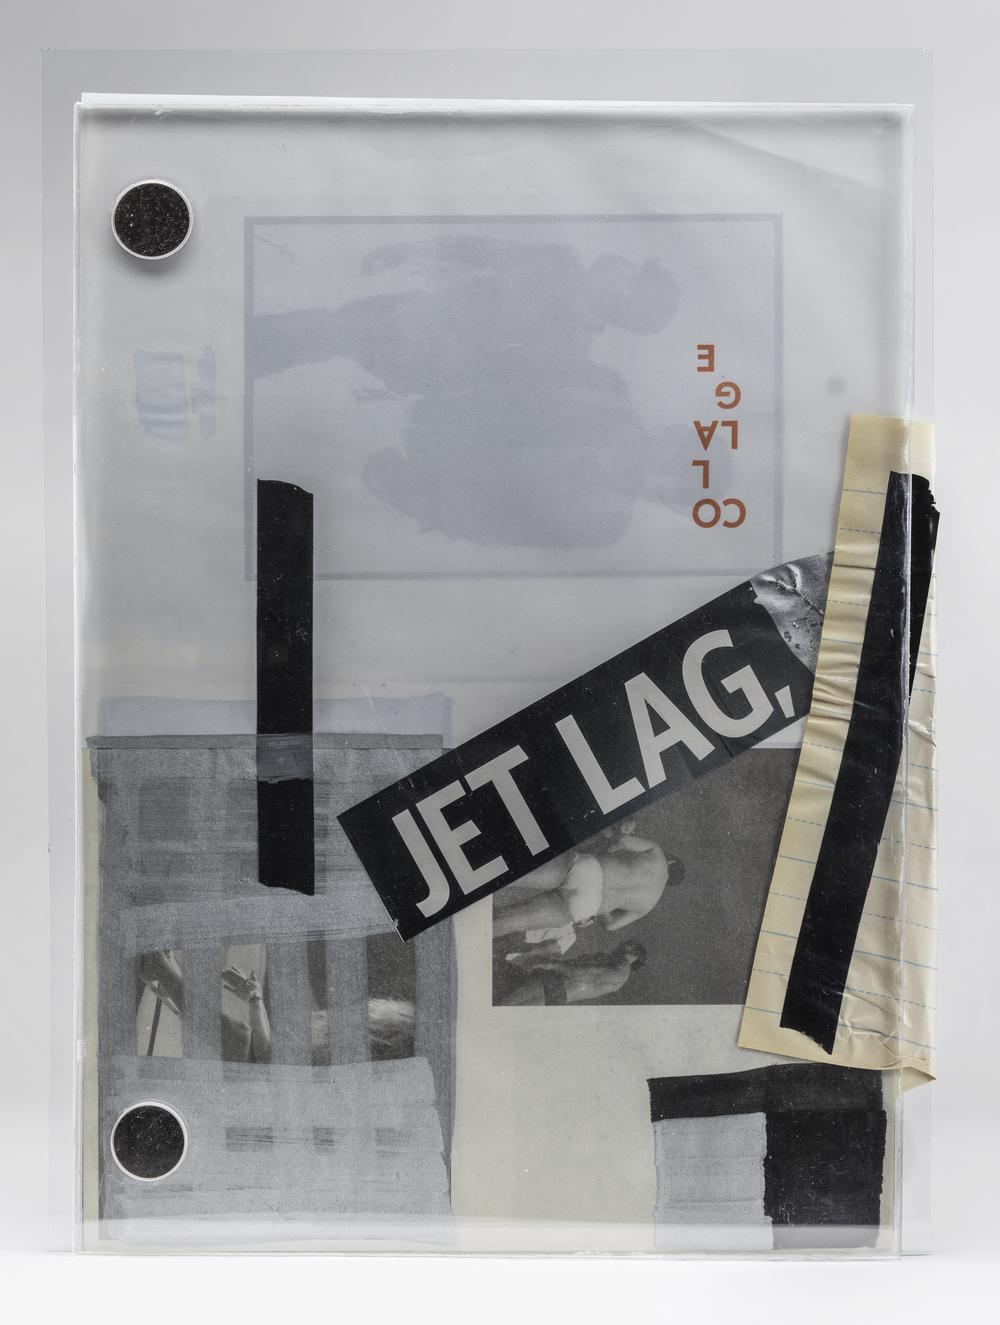 JetLag-toprint.jpg